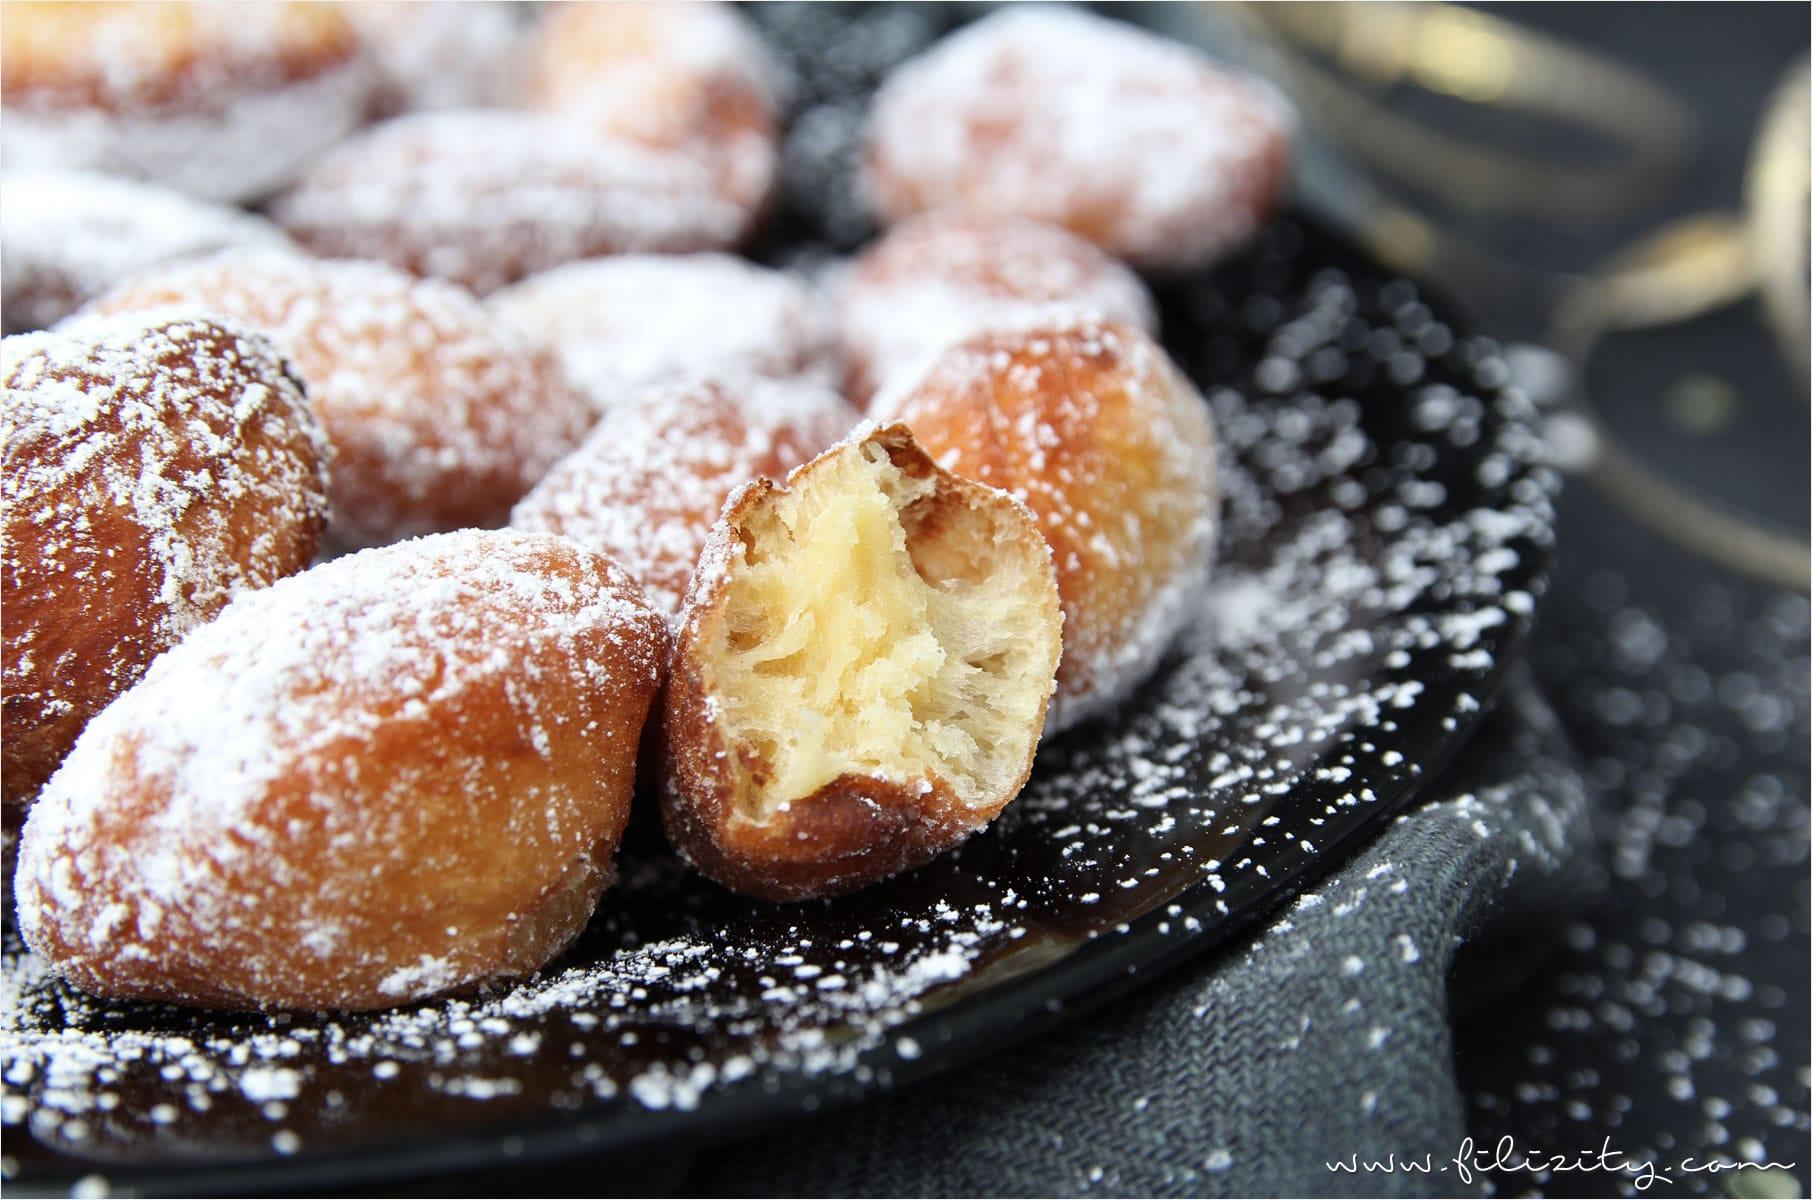 Fasching-Rezept: Mini-Krapfen | Filizity.com | Food-Blog aus dem Rheinland #fasching #karneval